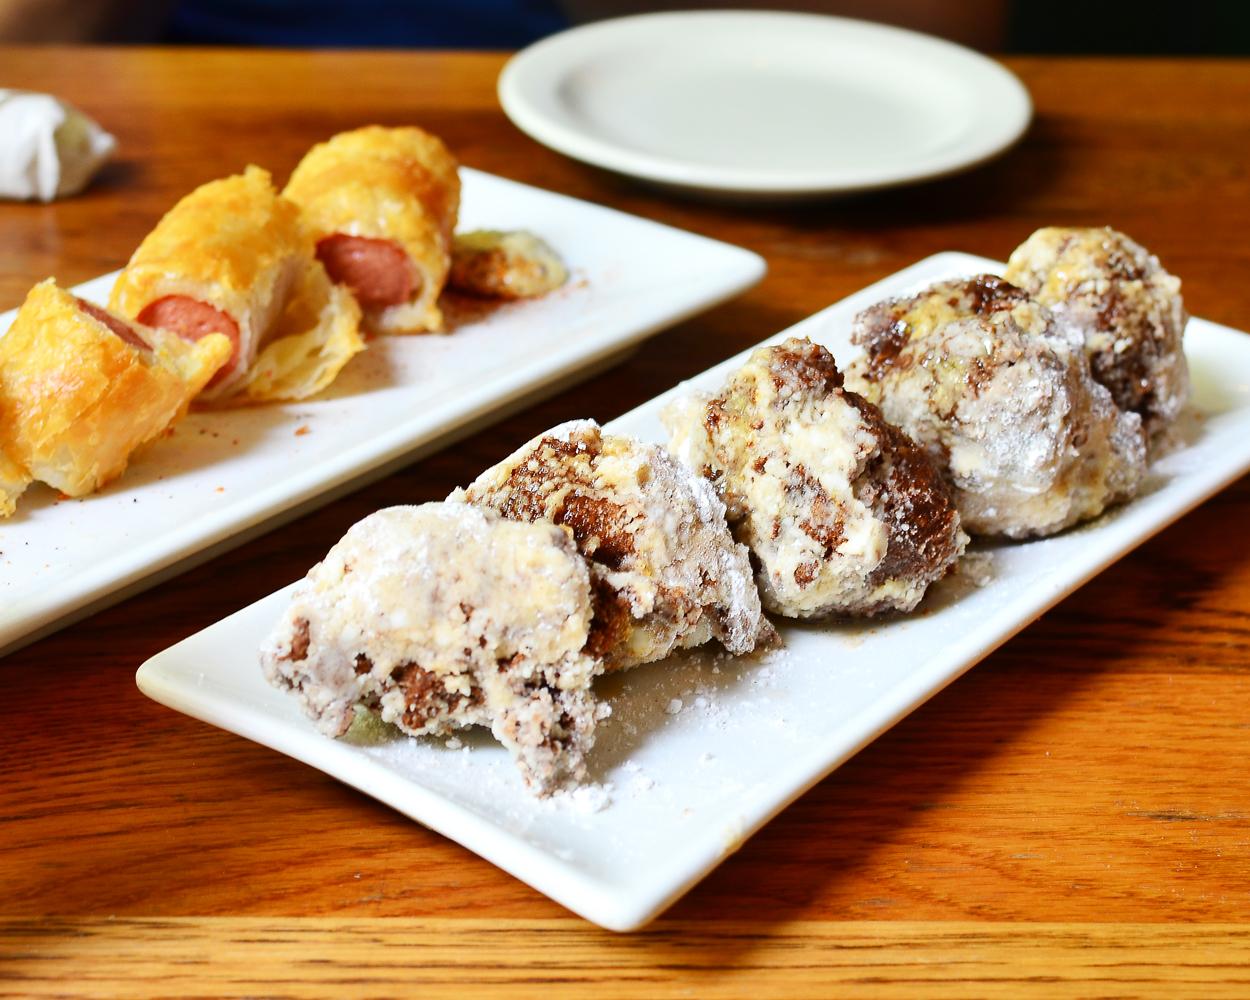 Folk Art - Sweet Potato Beignets and the I Dream of Weenie (pigs in a blanket)